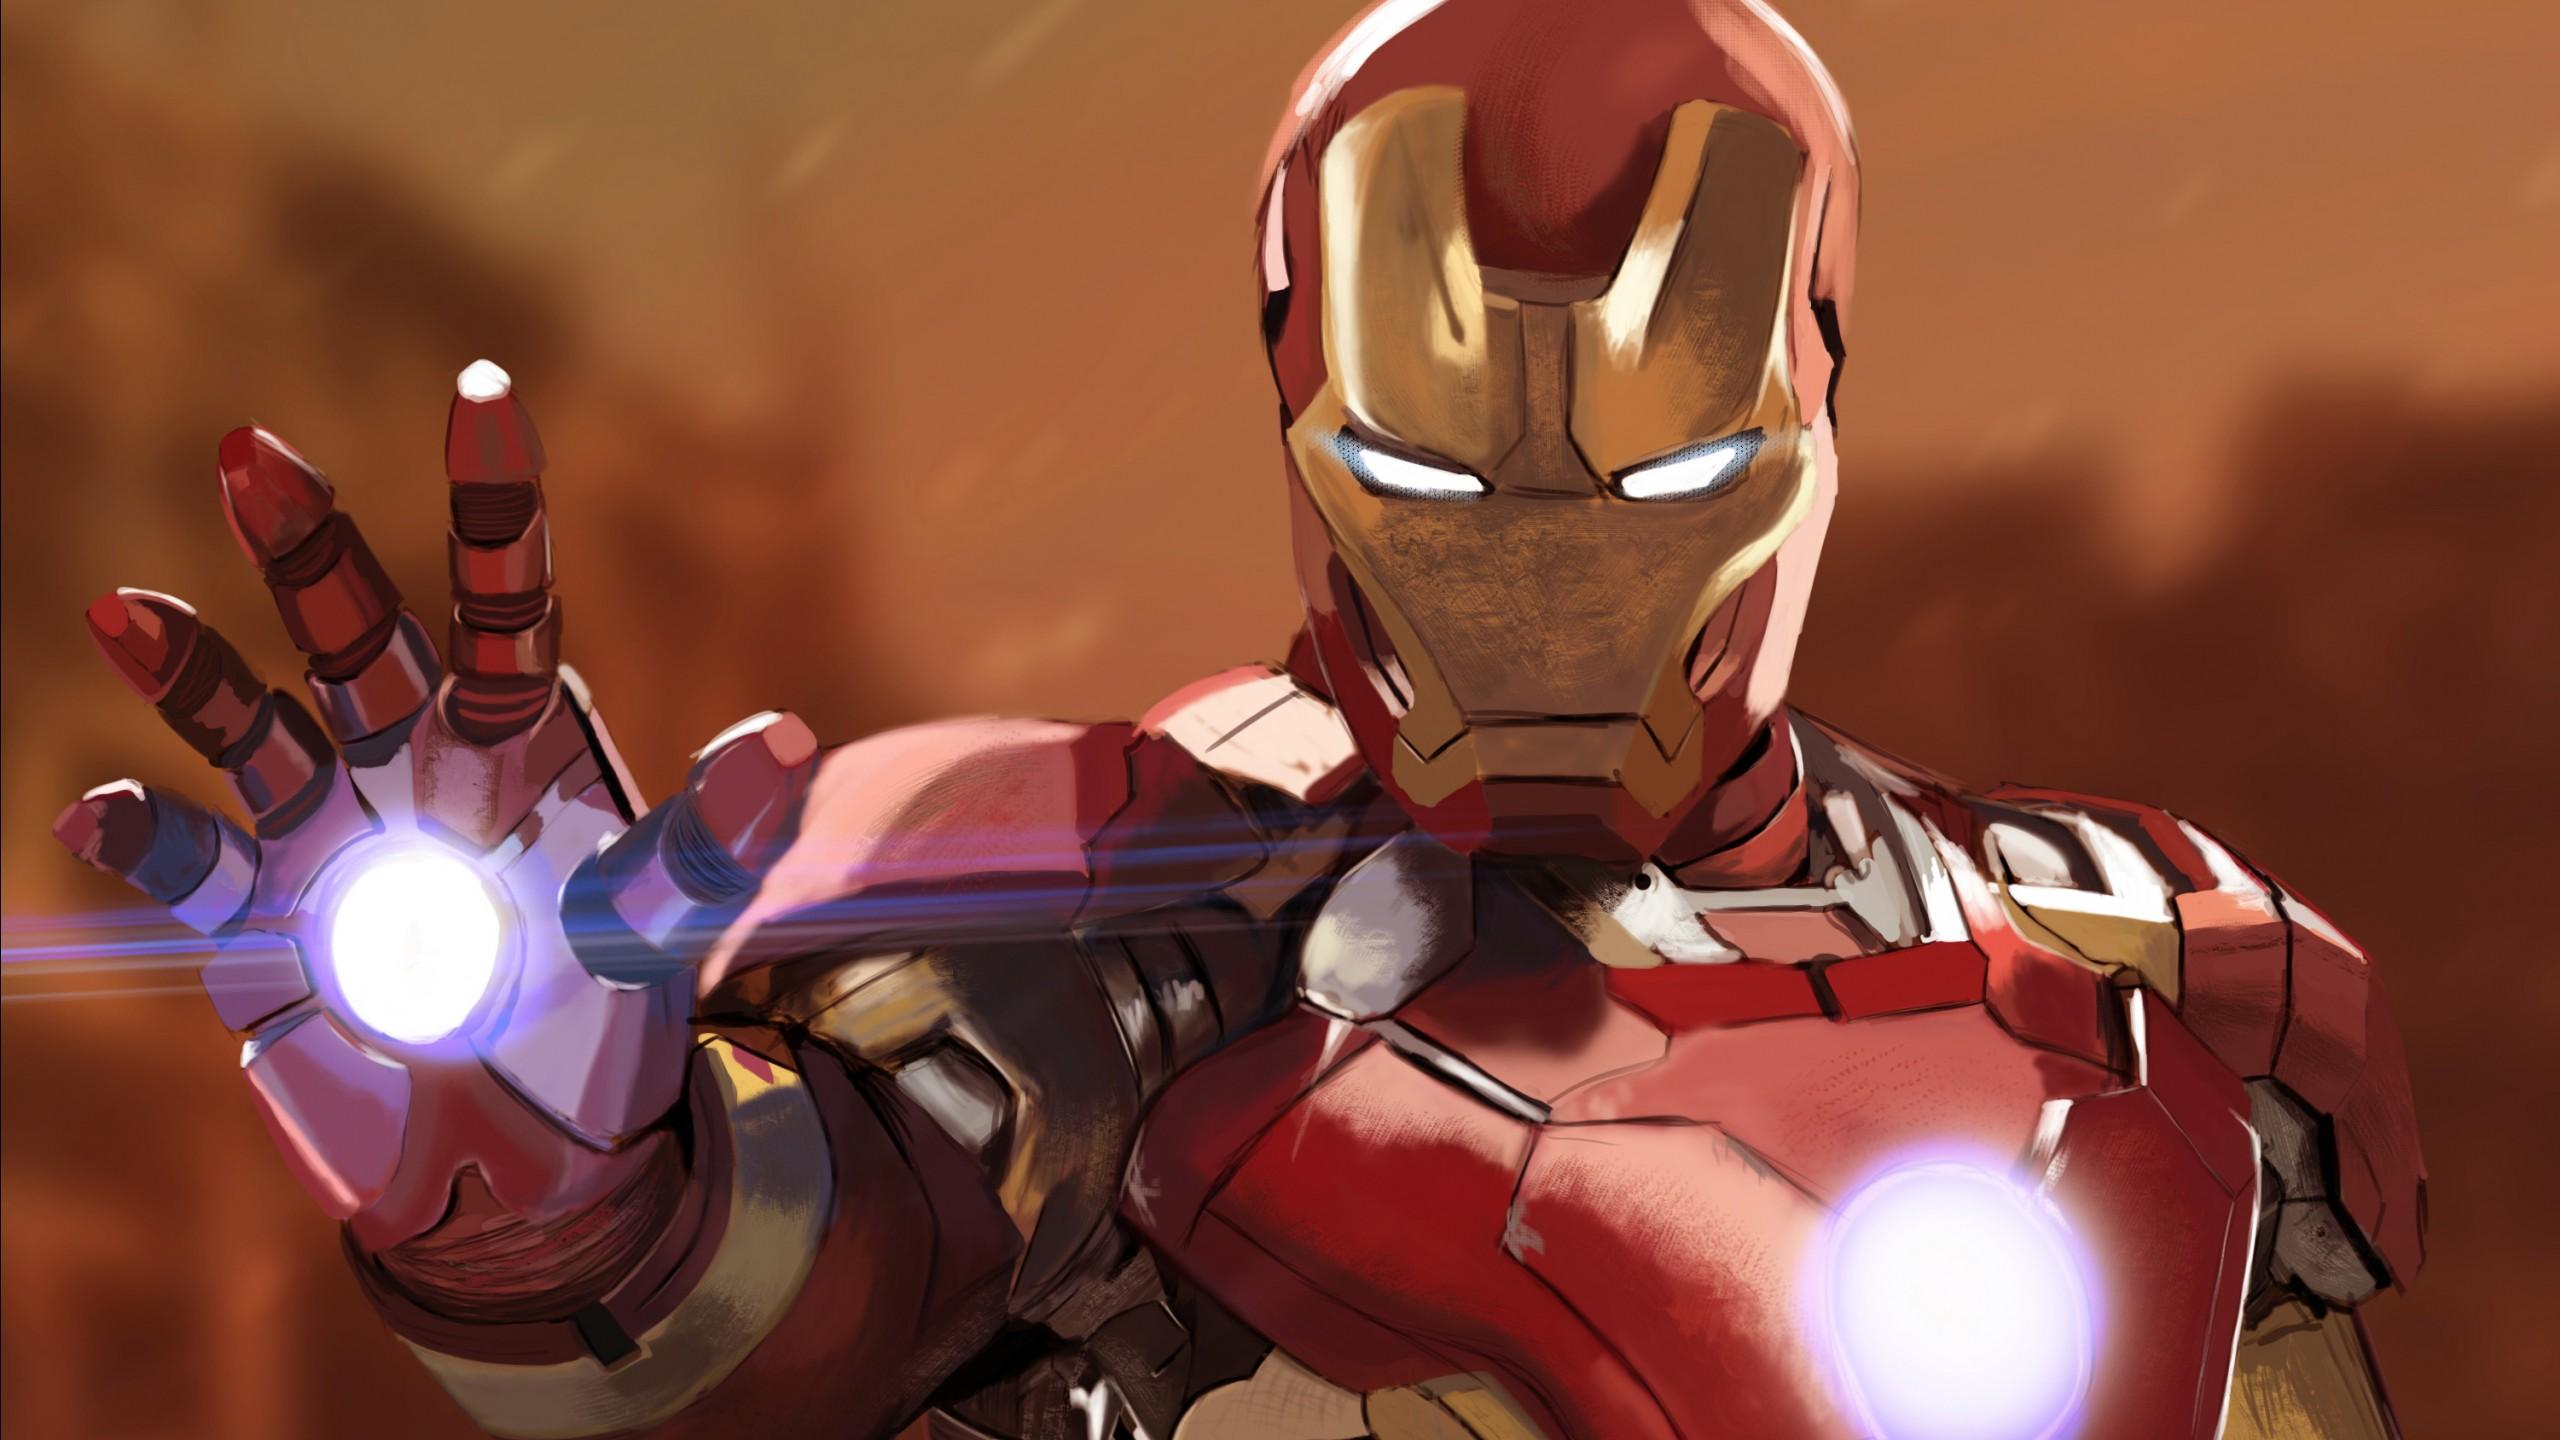 Iron Man 3d Wallpaper Download Iron Man Artwork Wallpapers Hd Wallpapers Id 25419